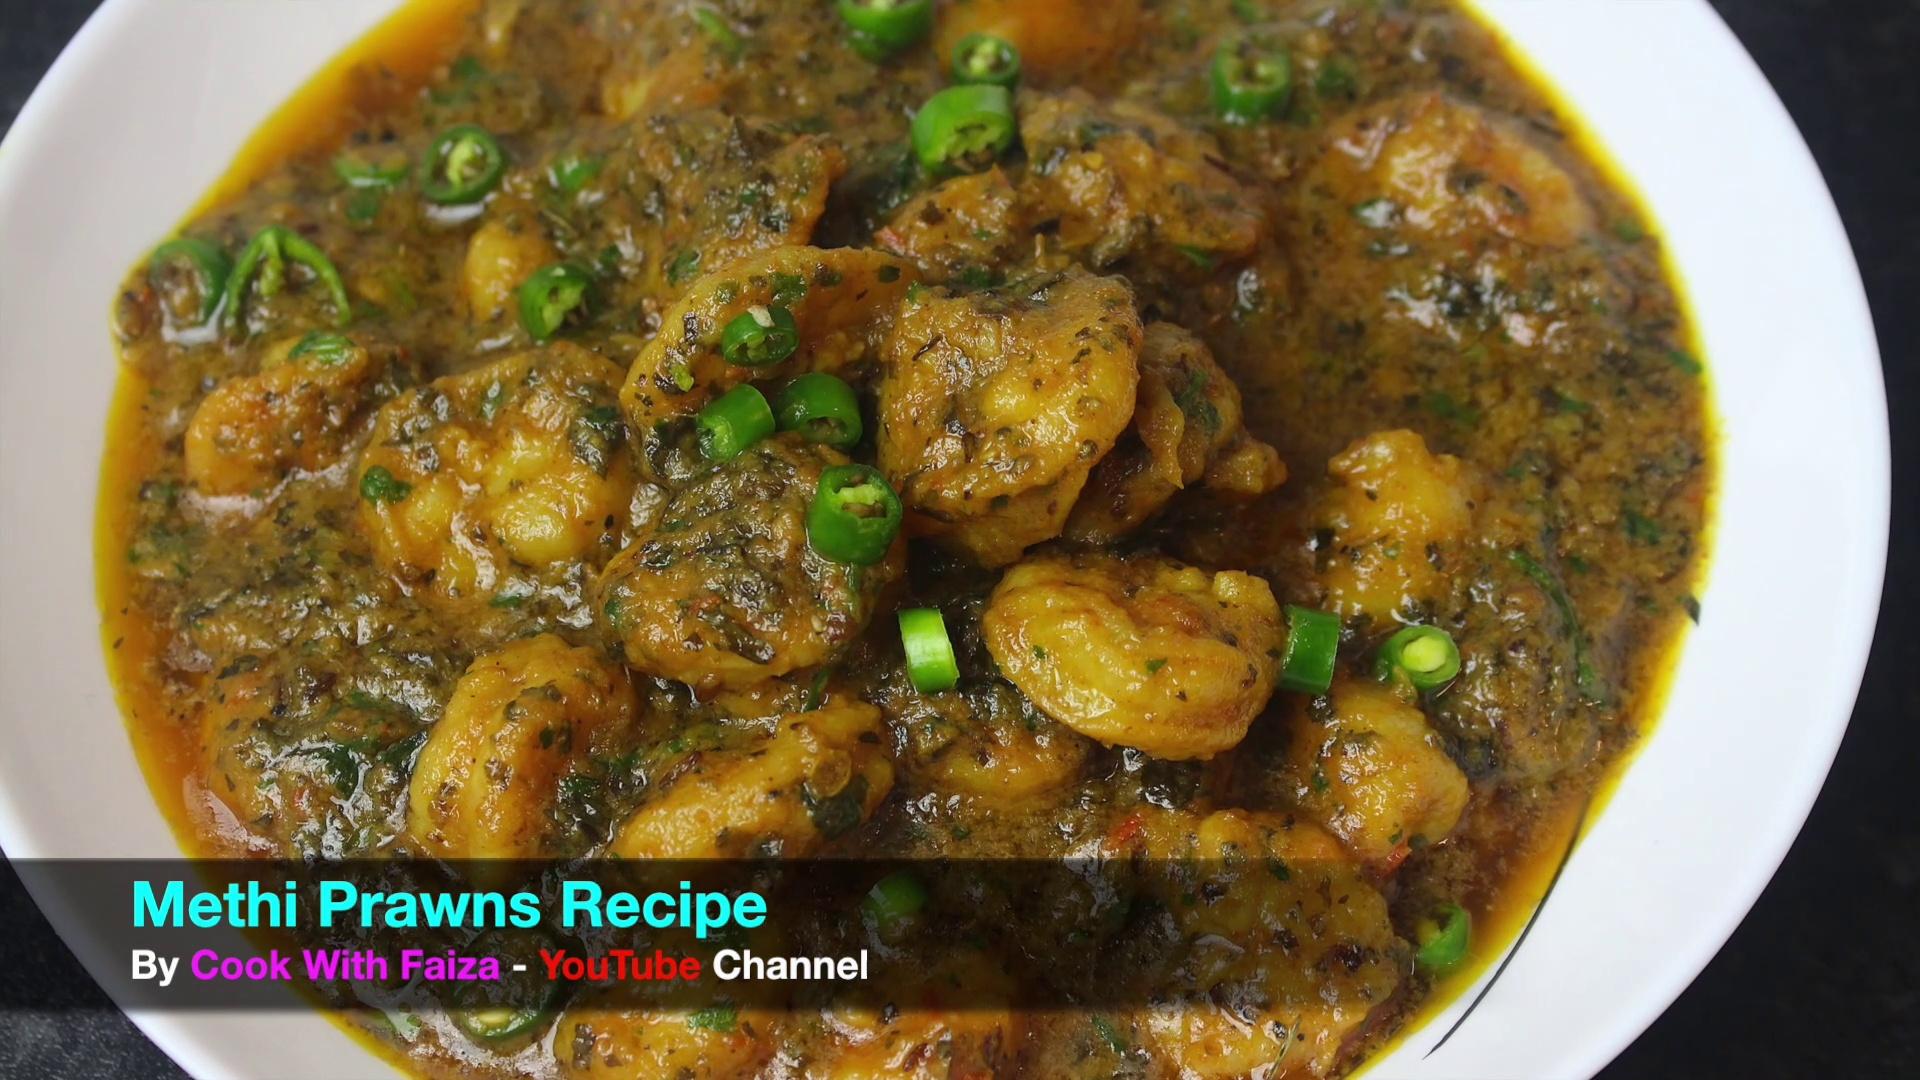 Methi Prawns Recipe | Shrimp Recipe | Prawn Curry Recipe By Cook With Faiza